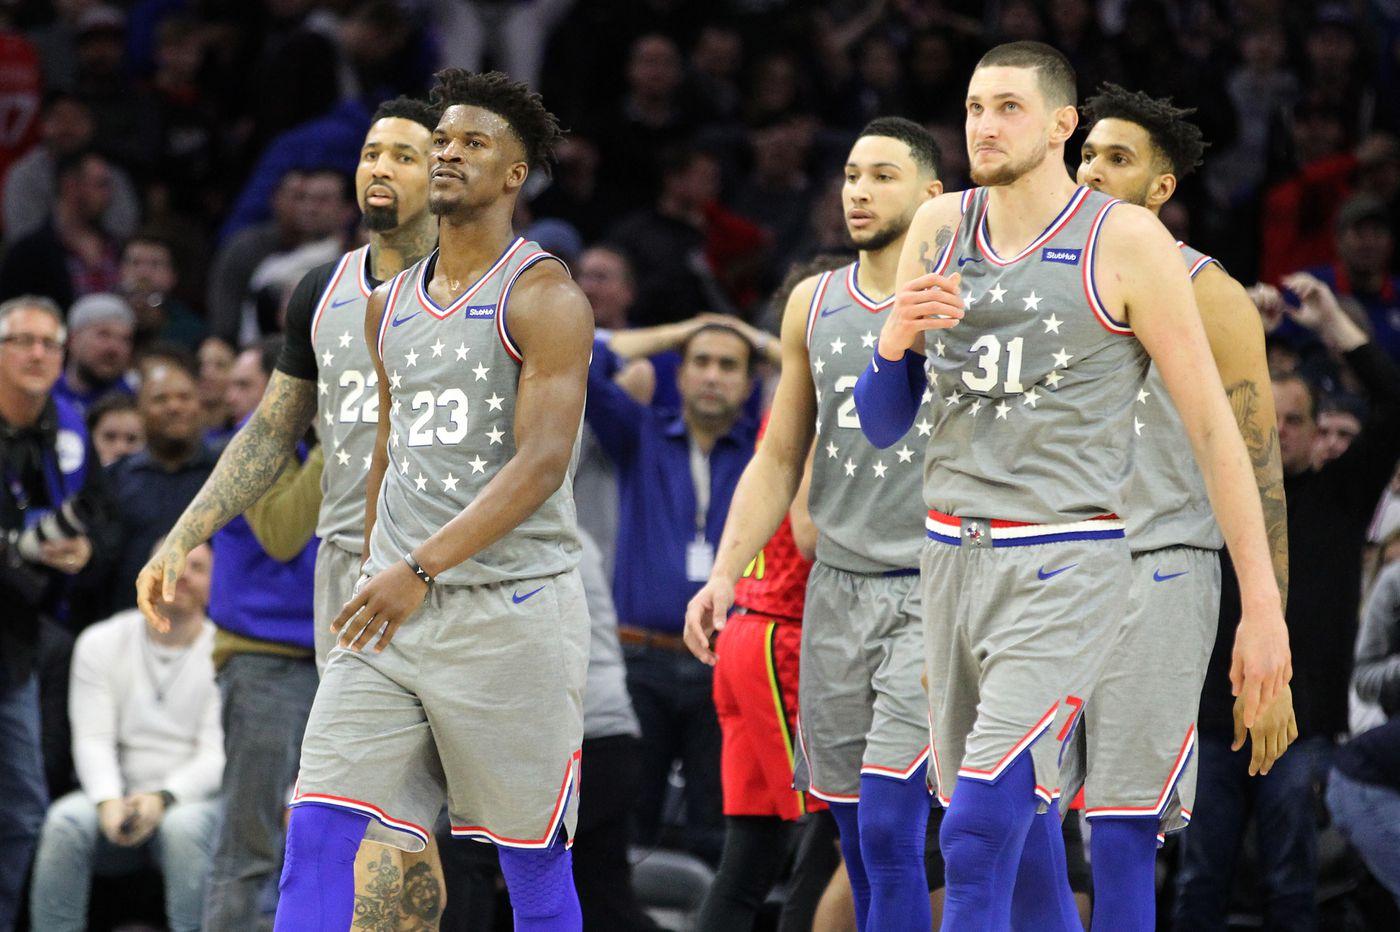 Sixers upset by Atlanta Hawks while missing Joel Embiid